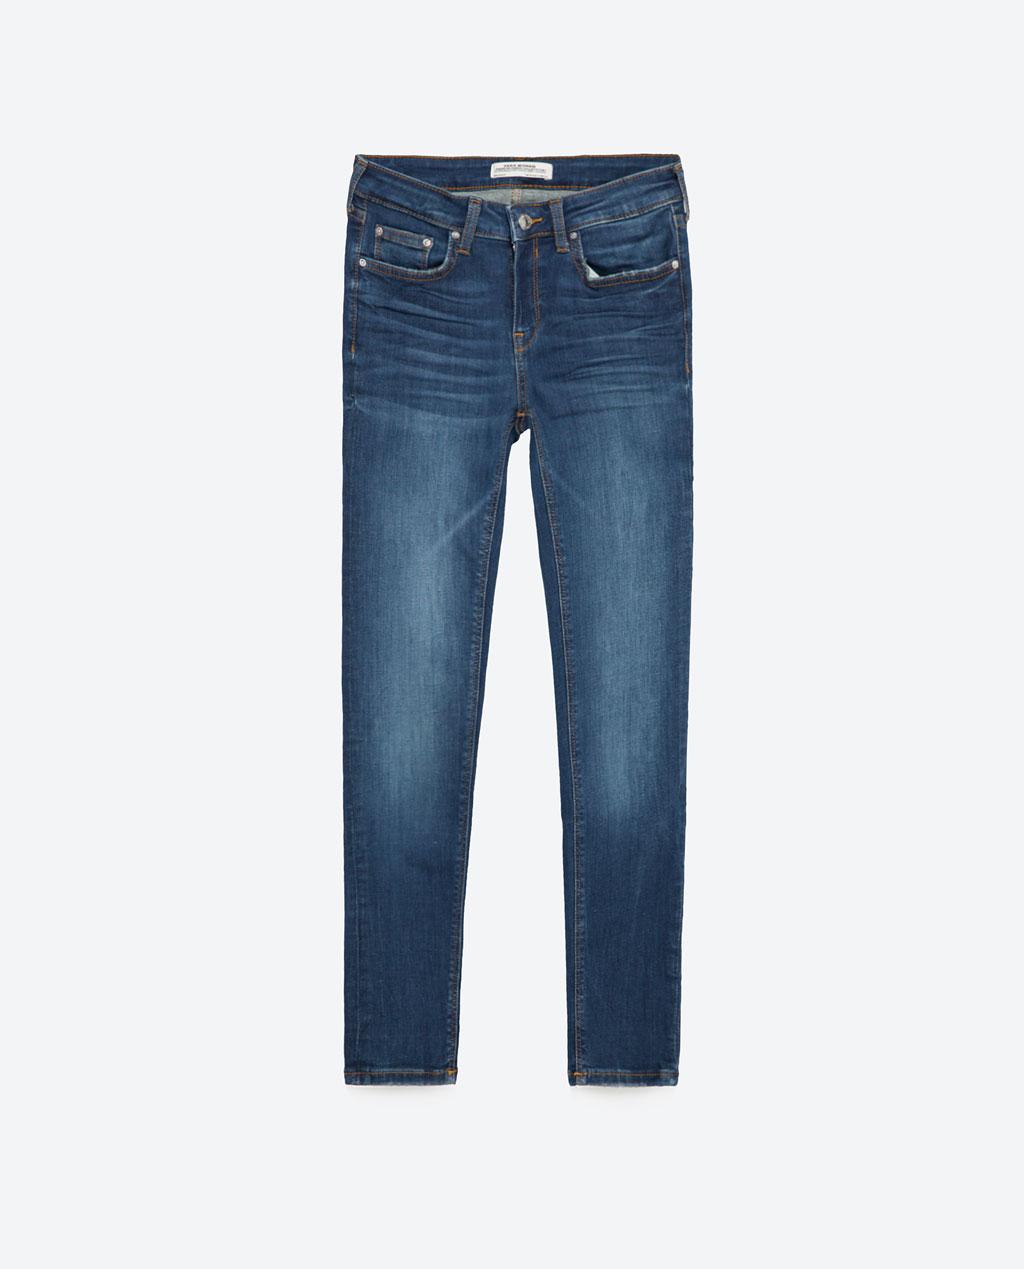 Zara-Mid-rise-skinny-Jeans.jpg